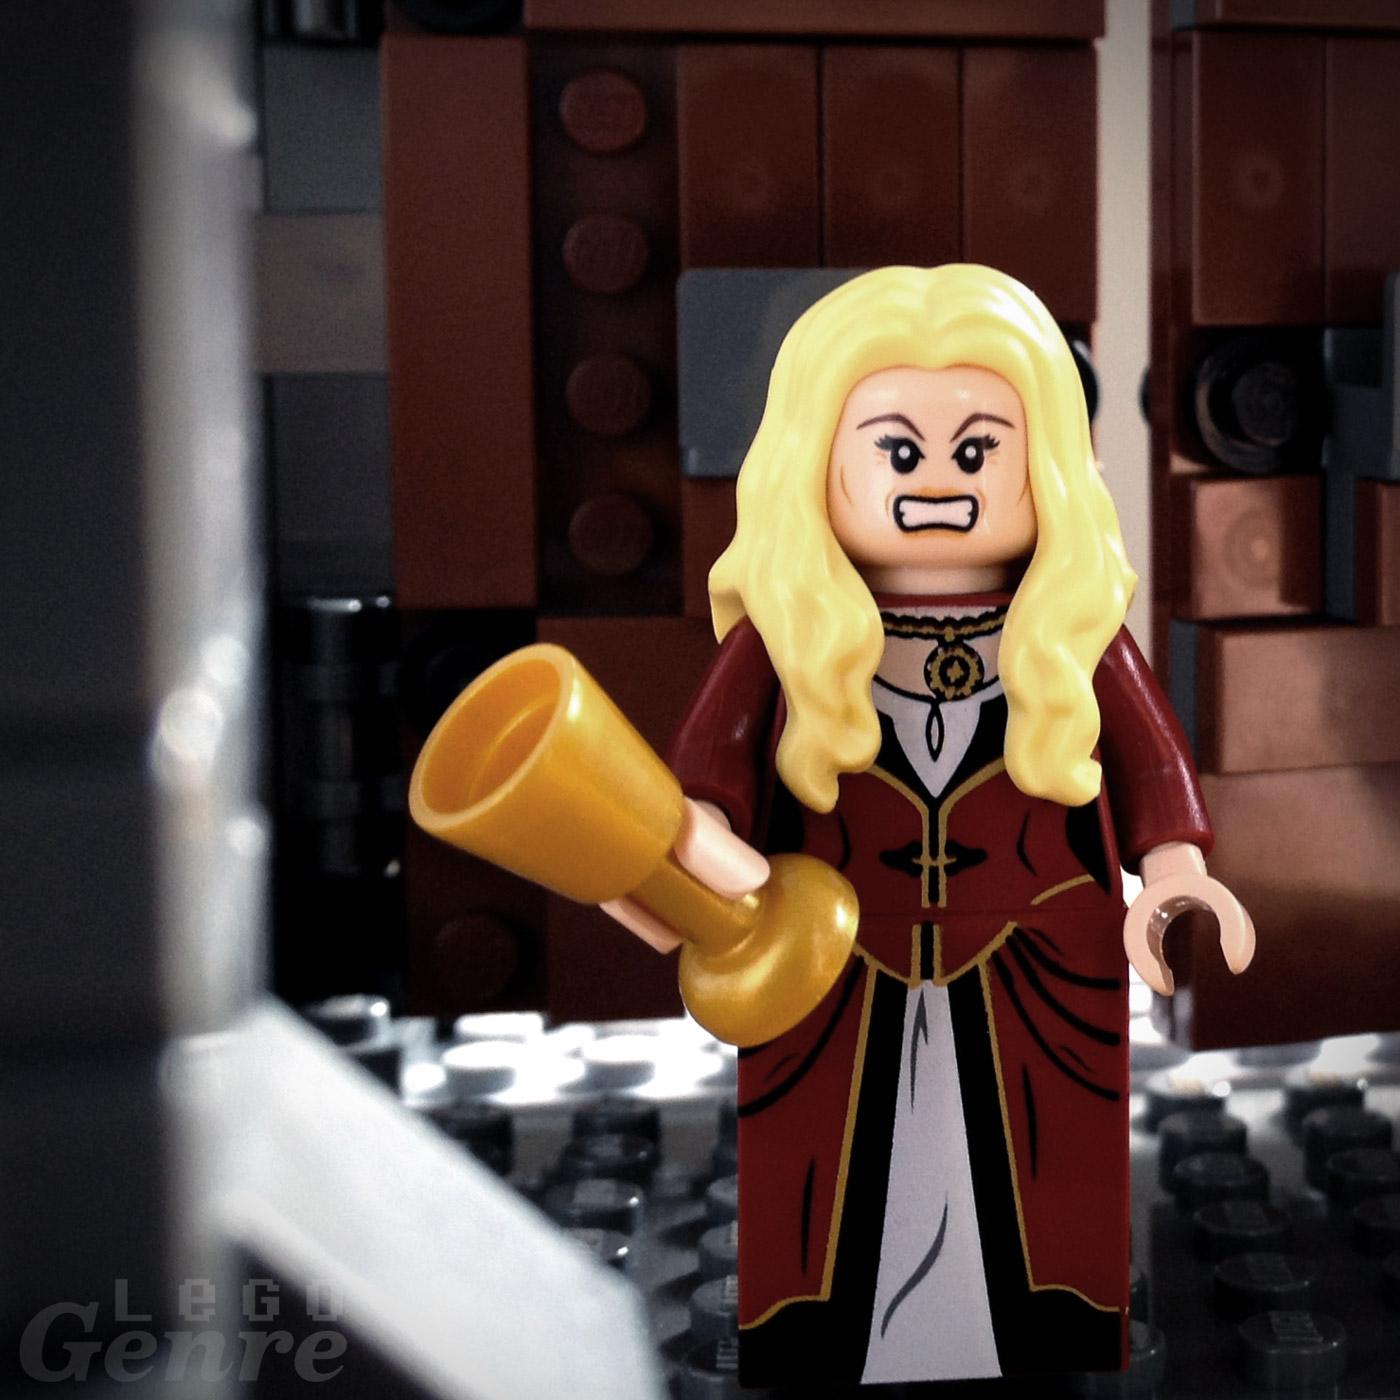 LegoGenre 00357: Cersei Lannister